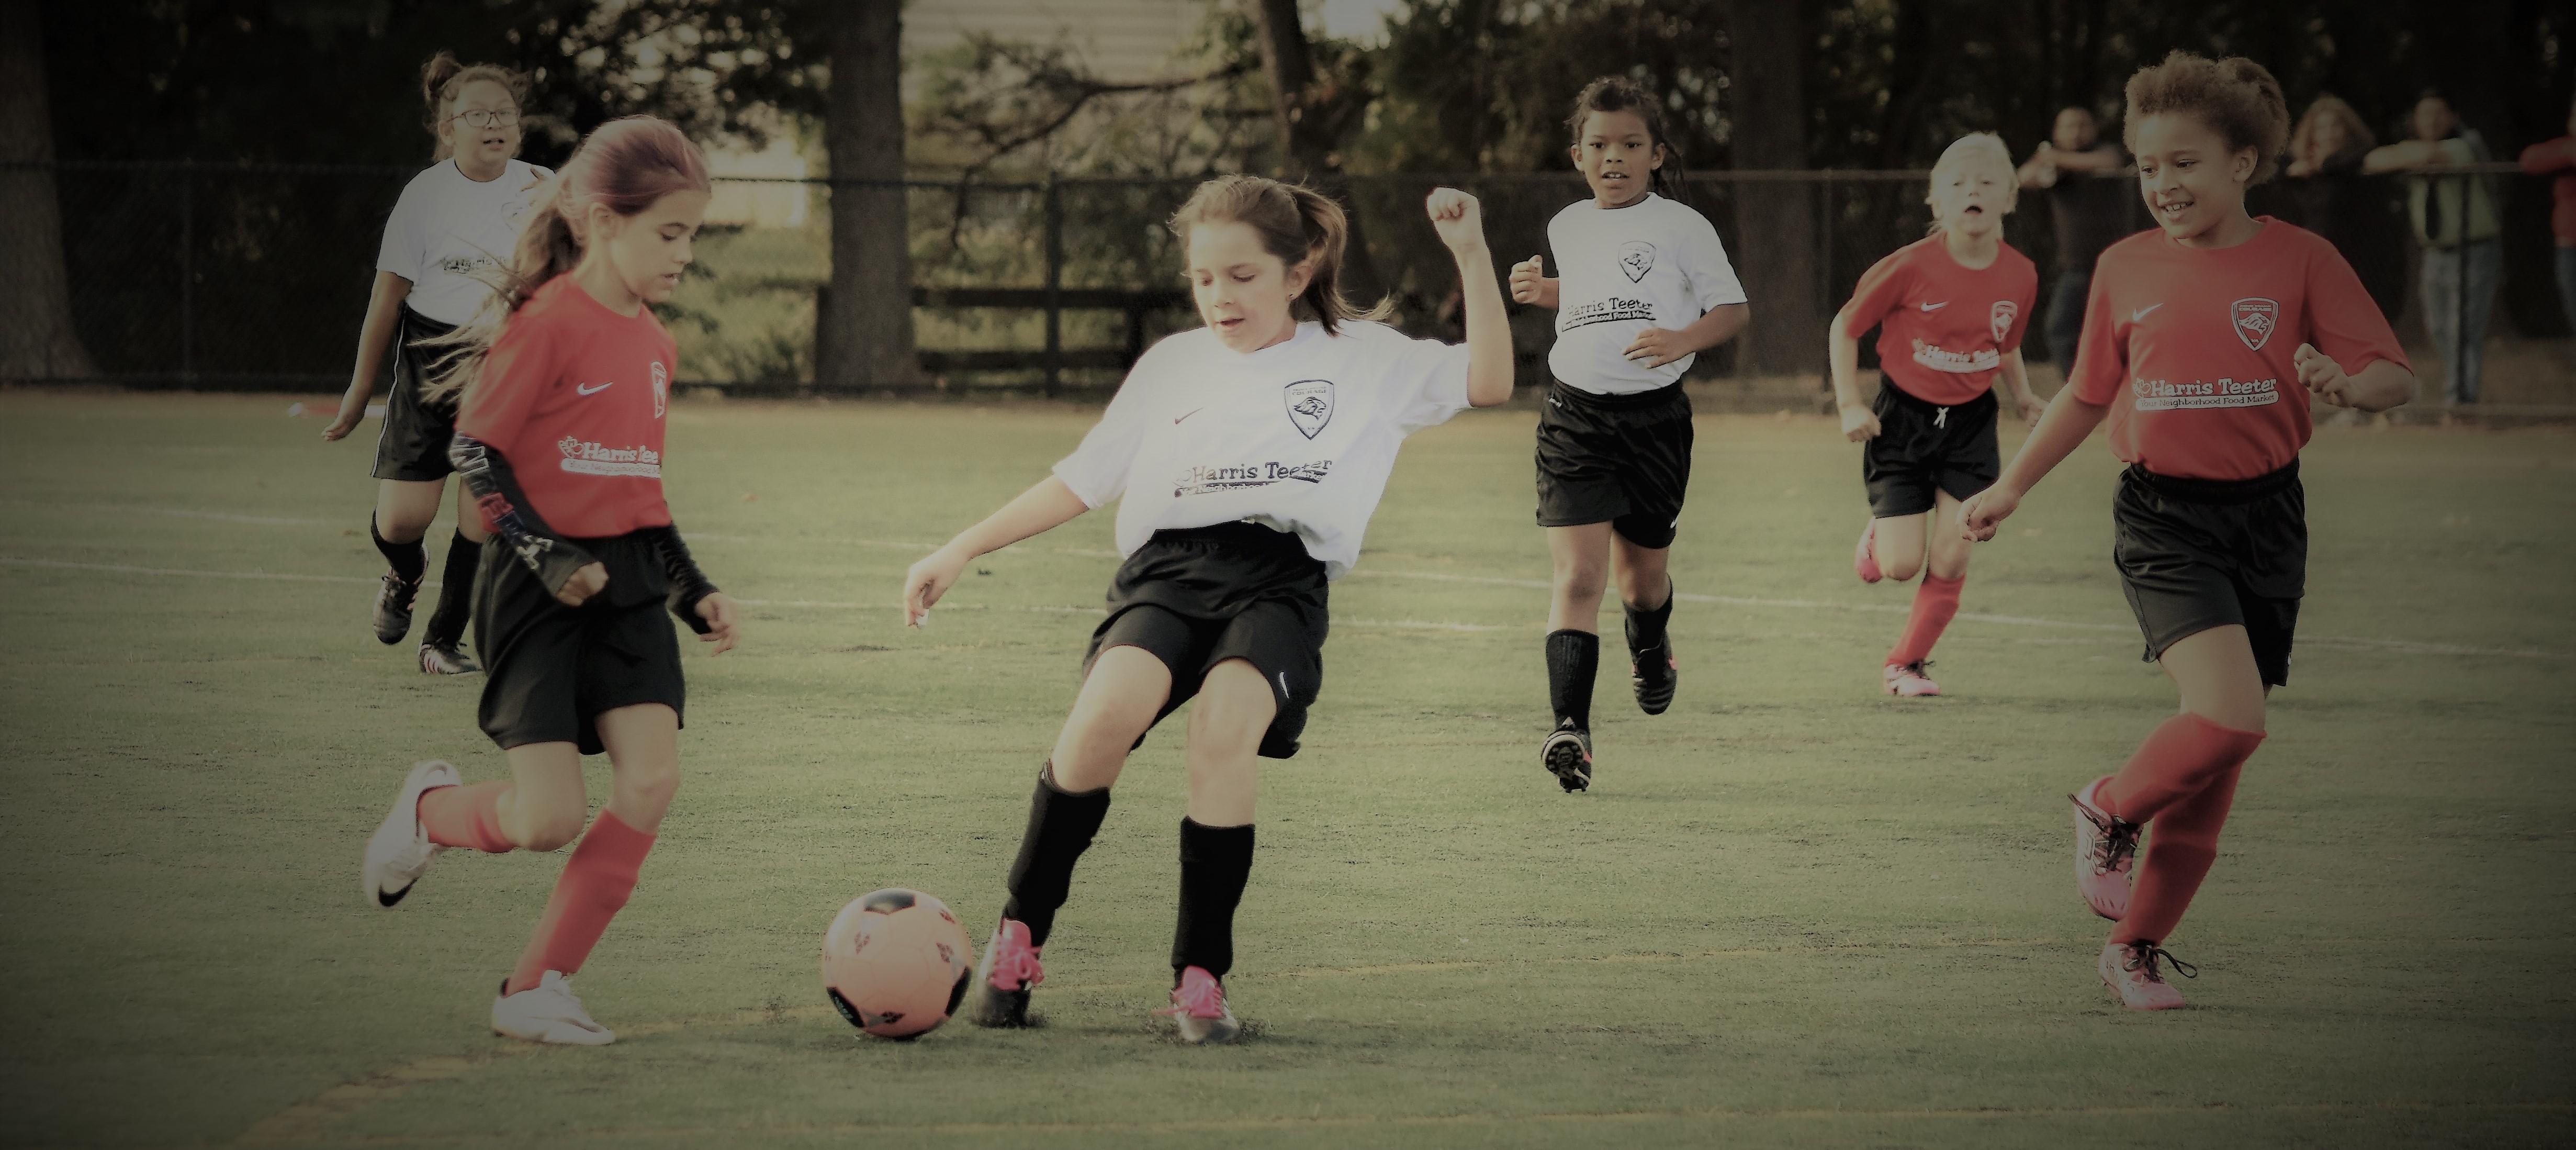 7f2c5fa6c Prince William Soccer Club